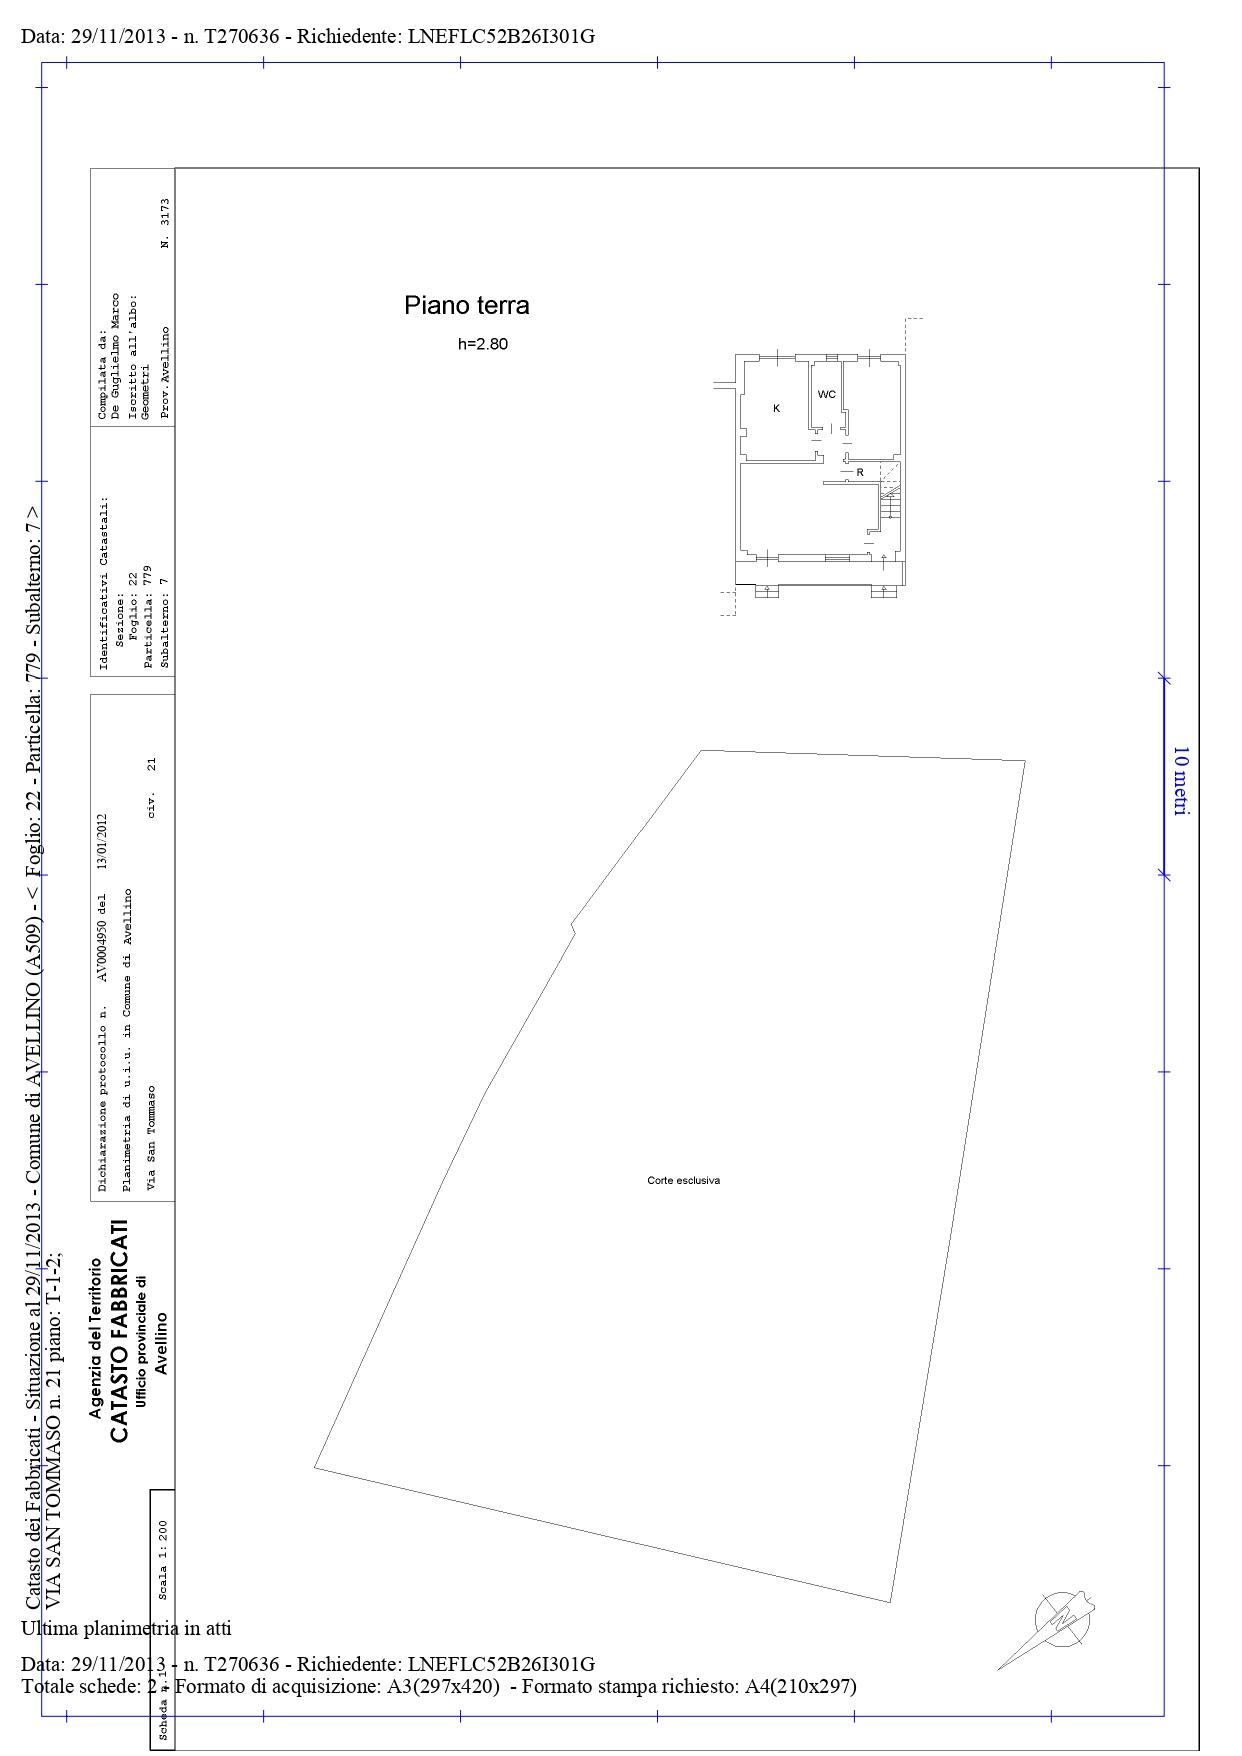 Planimetria Villa a Schiera De Peruta_page-0001.jpg